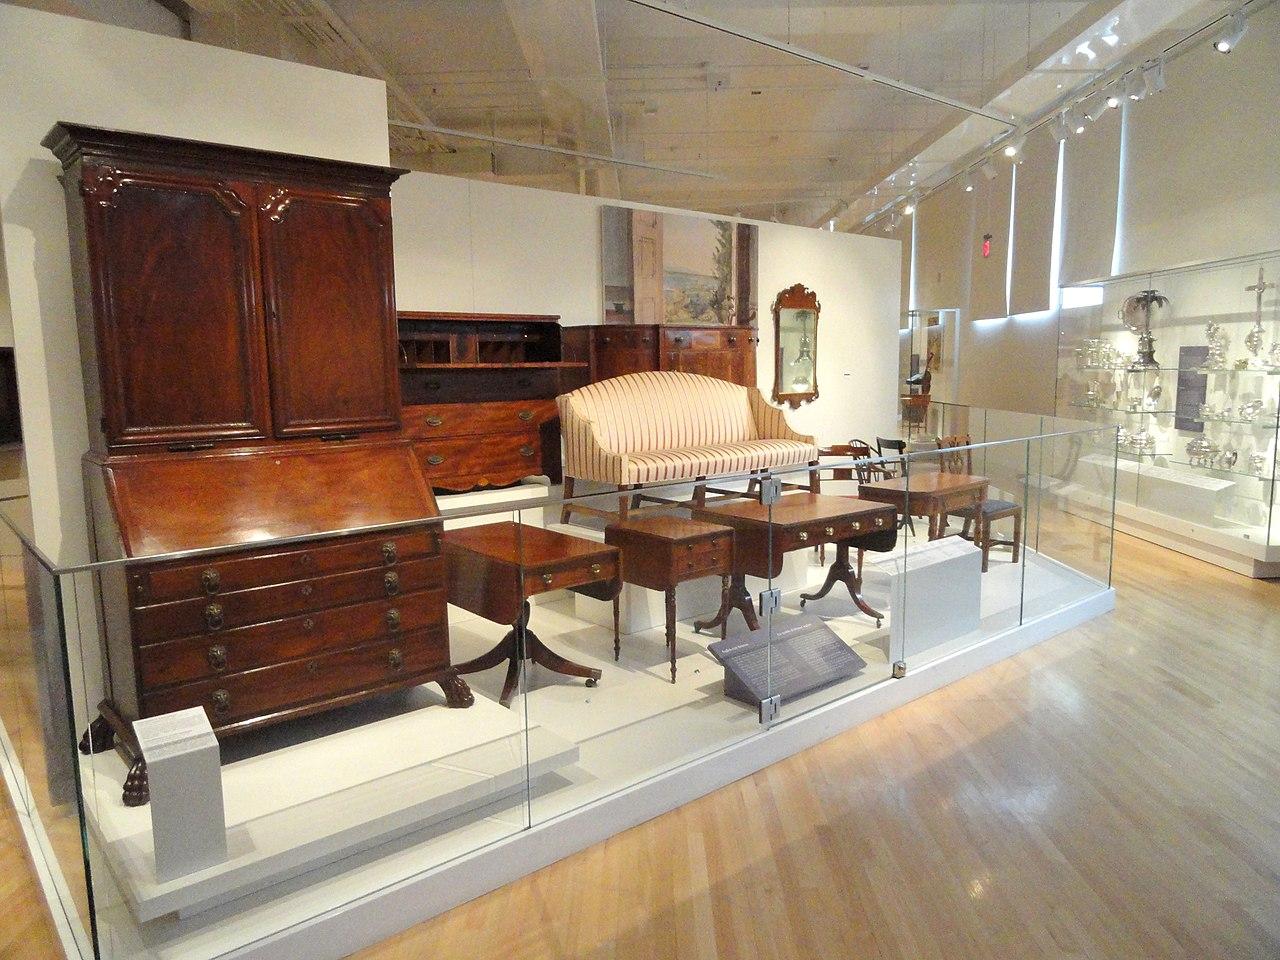 File:Interior View, Canadian Furniture   Royal Ontario Museum   DSC00269.JPG